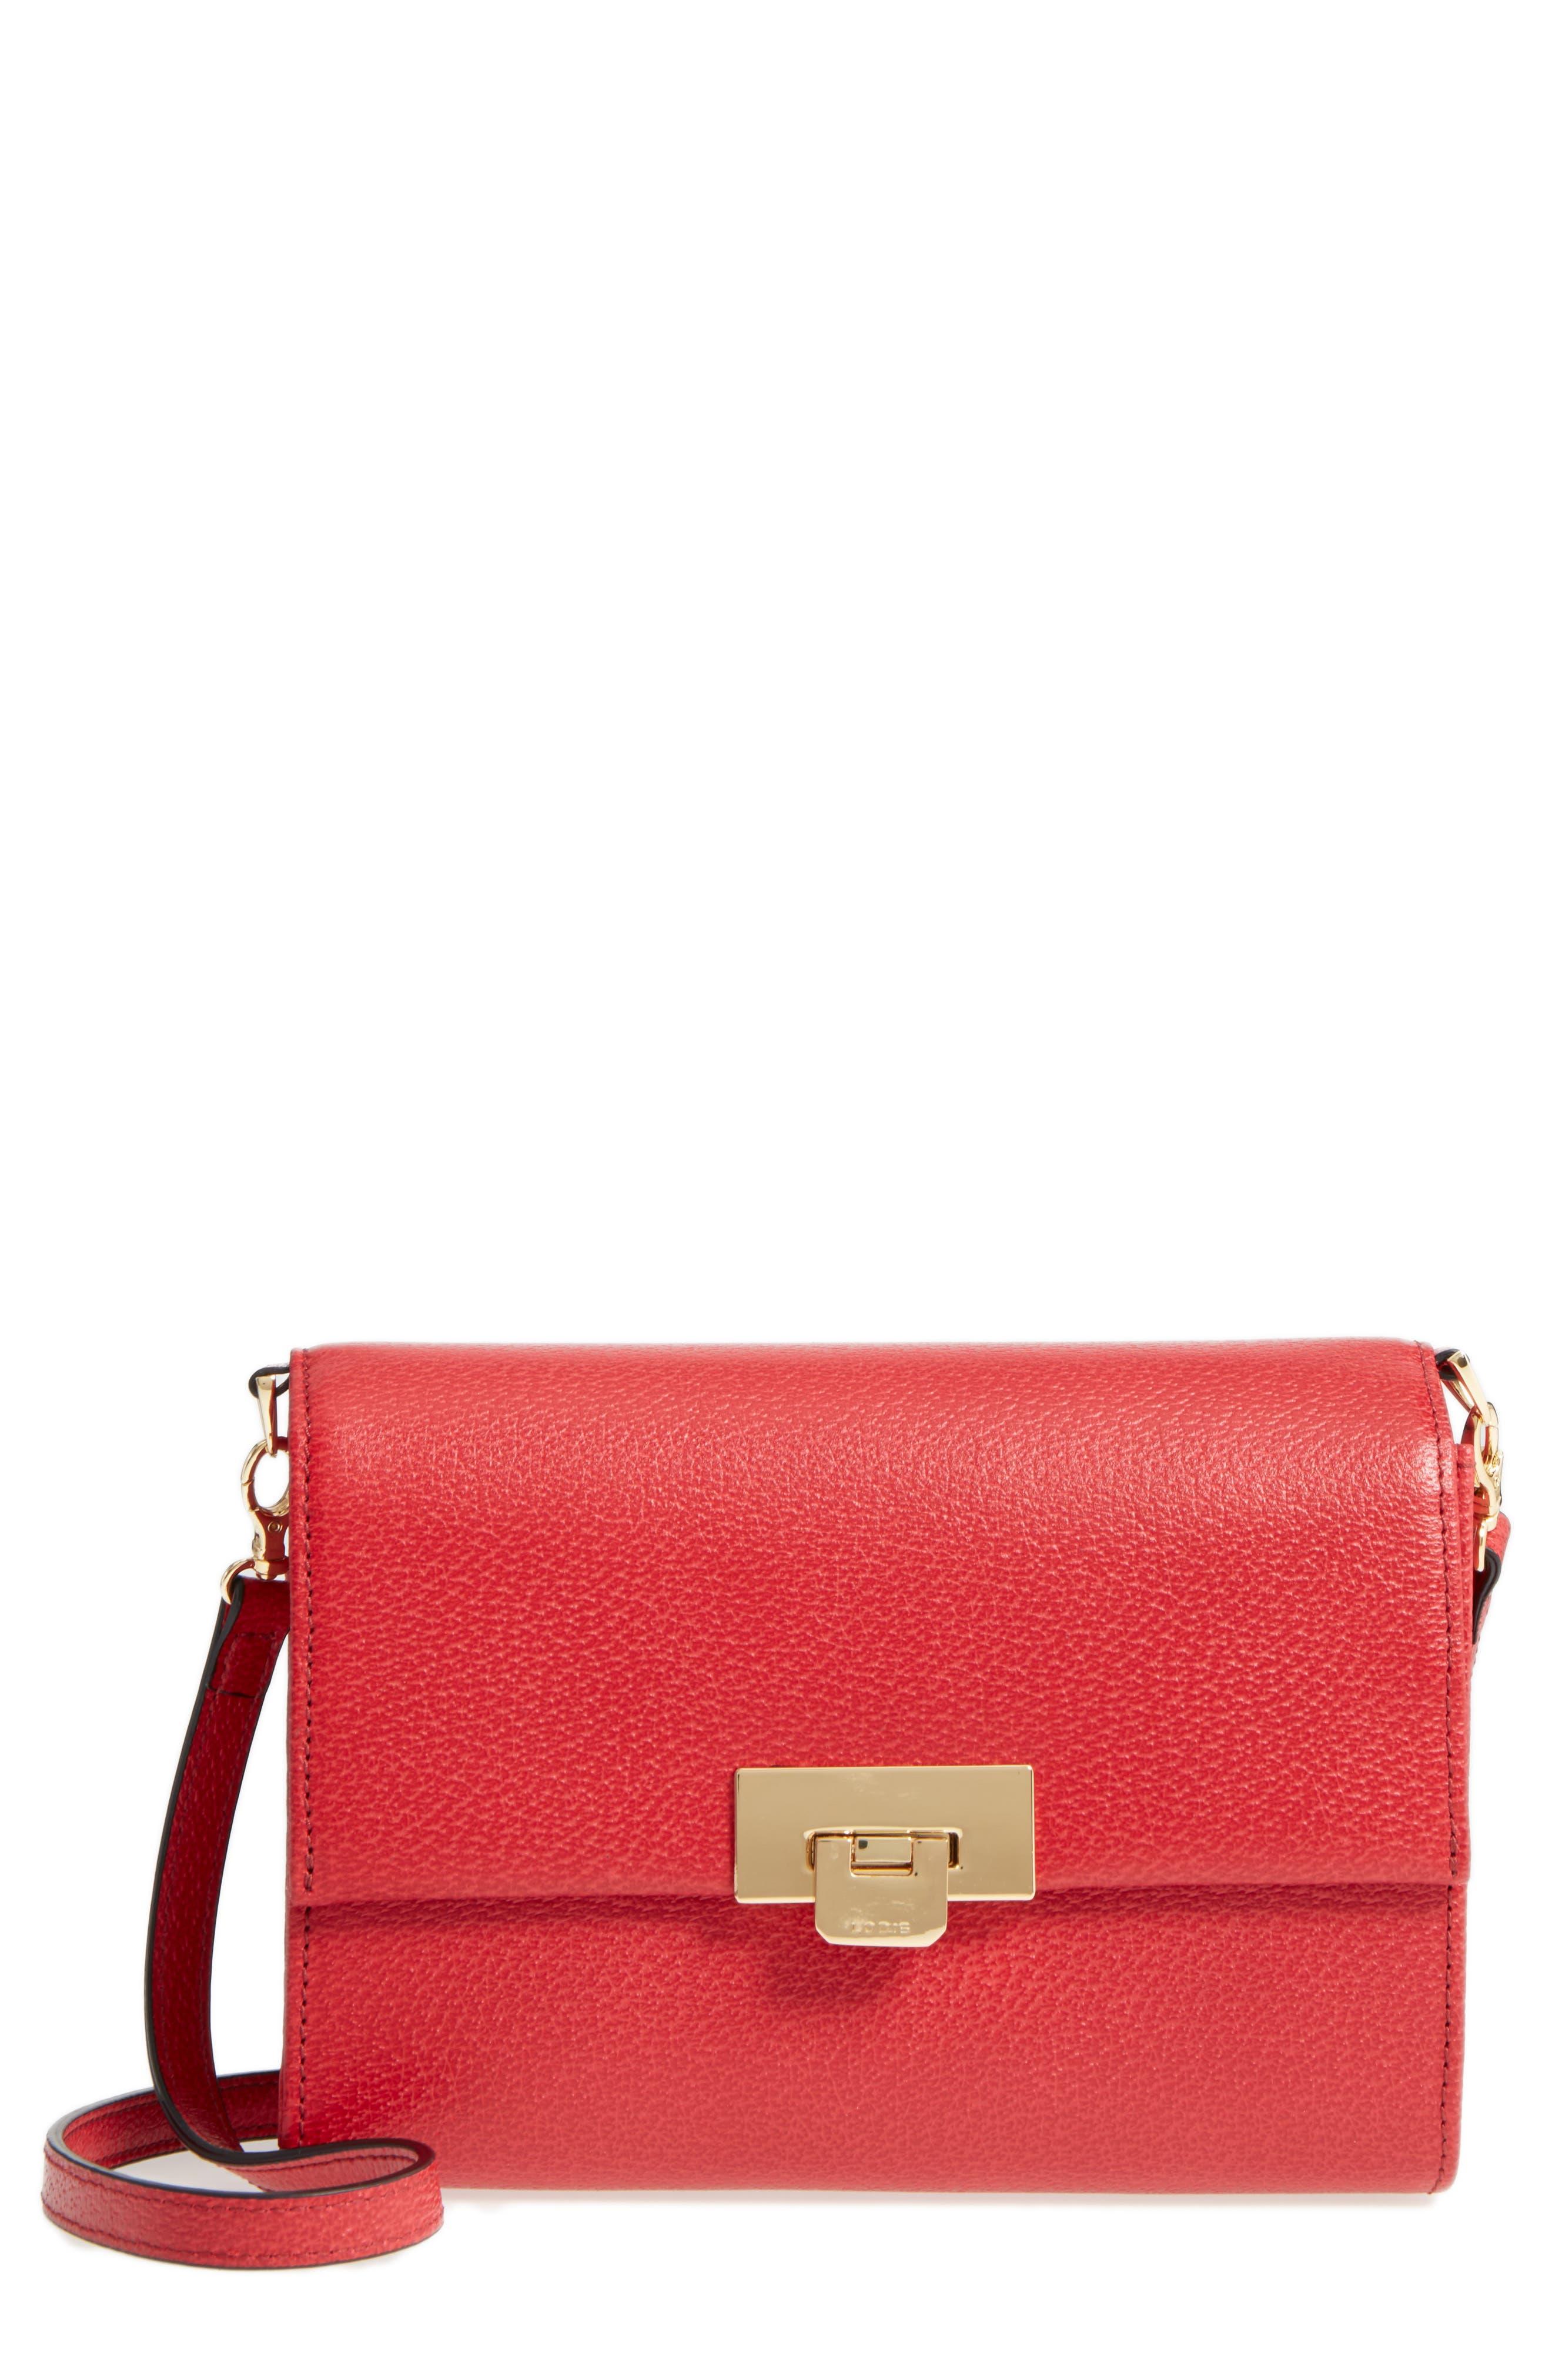 LODIS Stephanie Under Lock & Key - Small Eden Leather Crossbody Bag,                             Main thumbnail 1, color,                             600